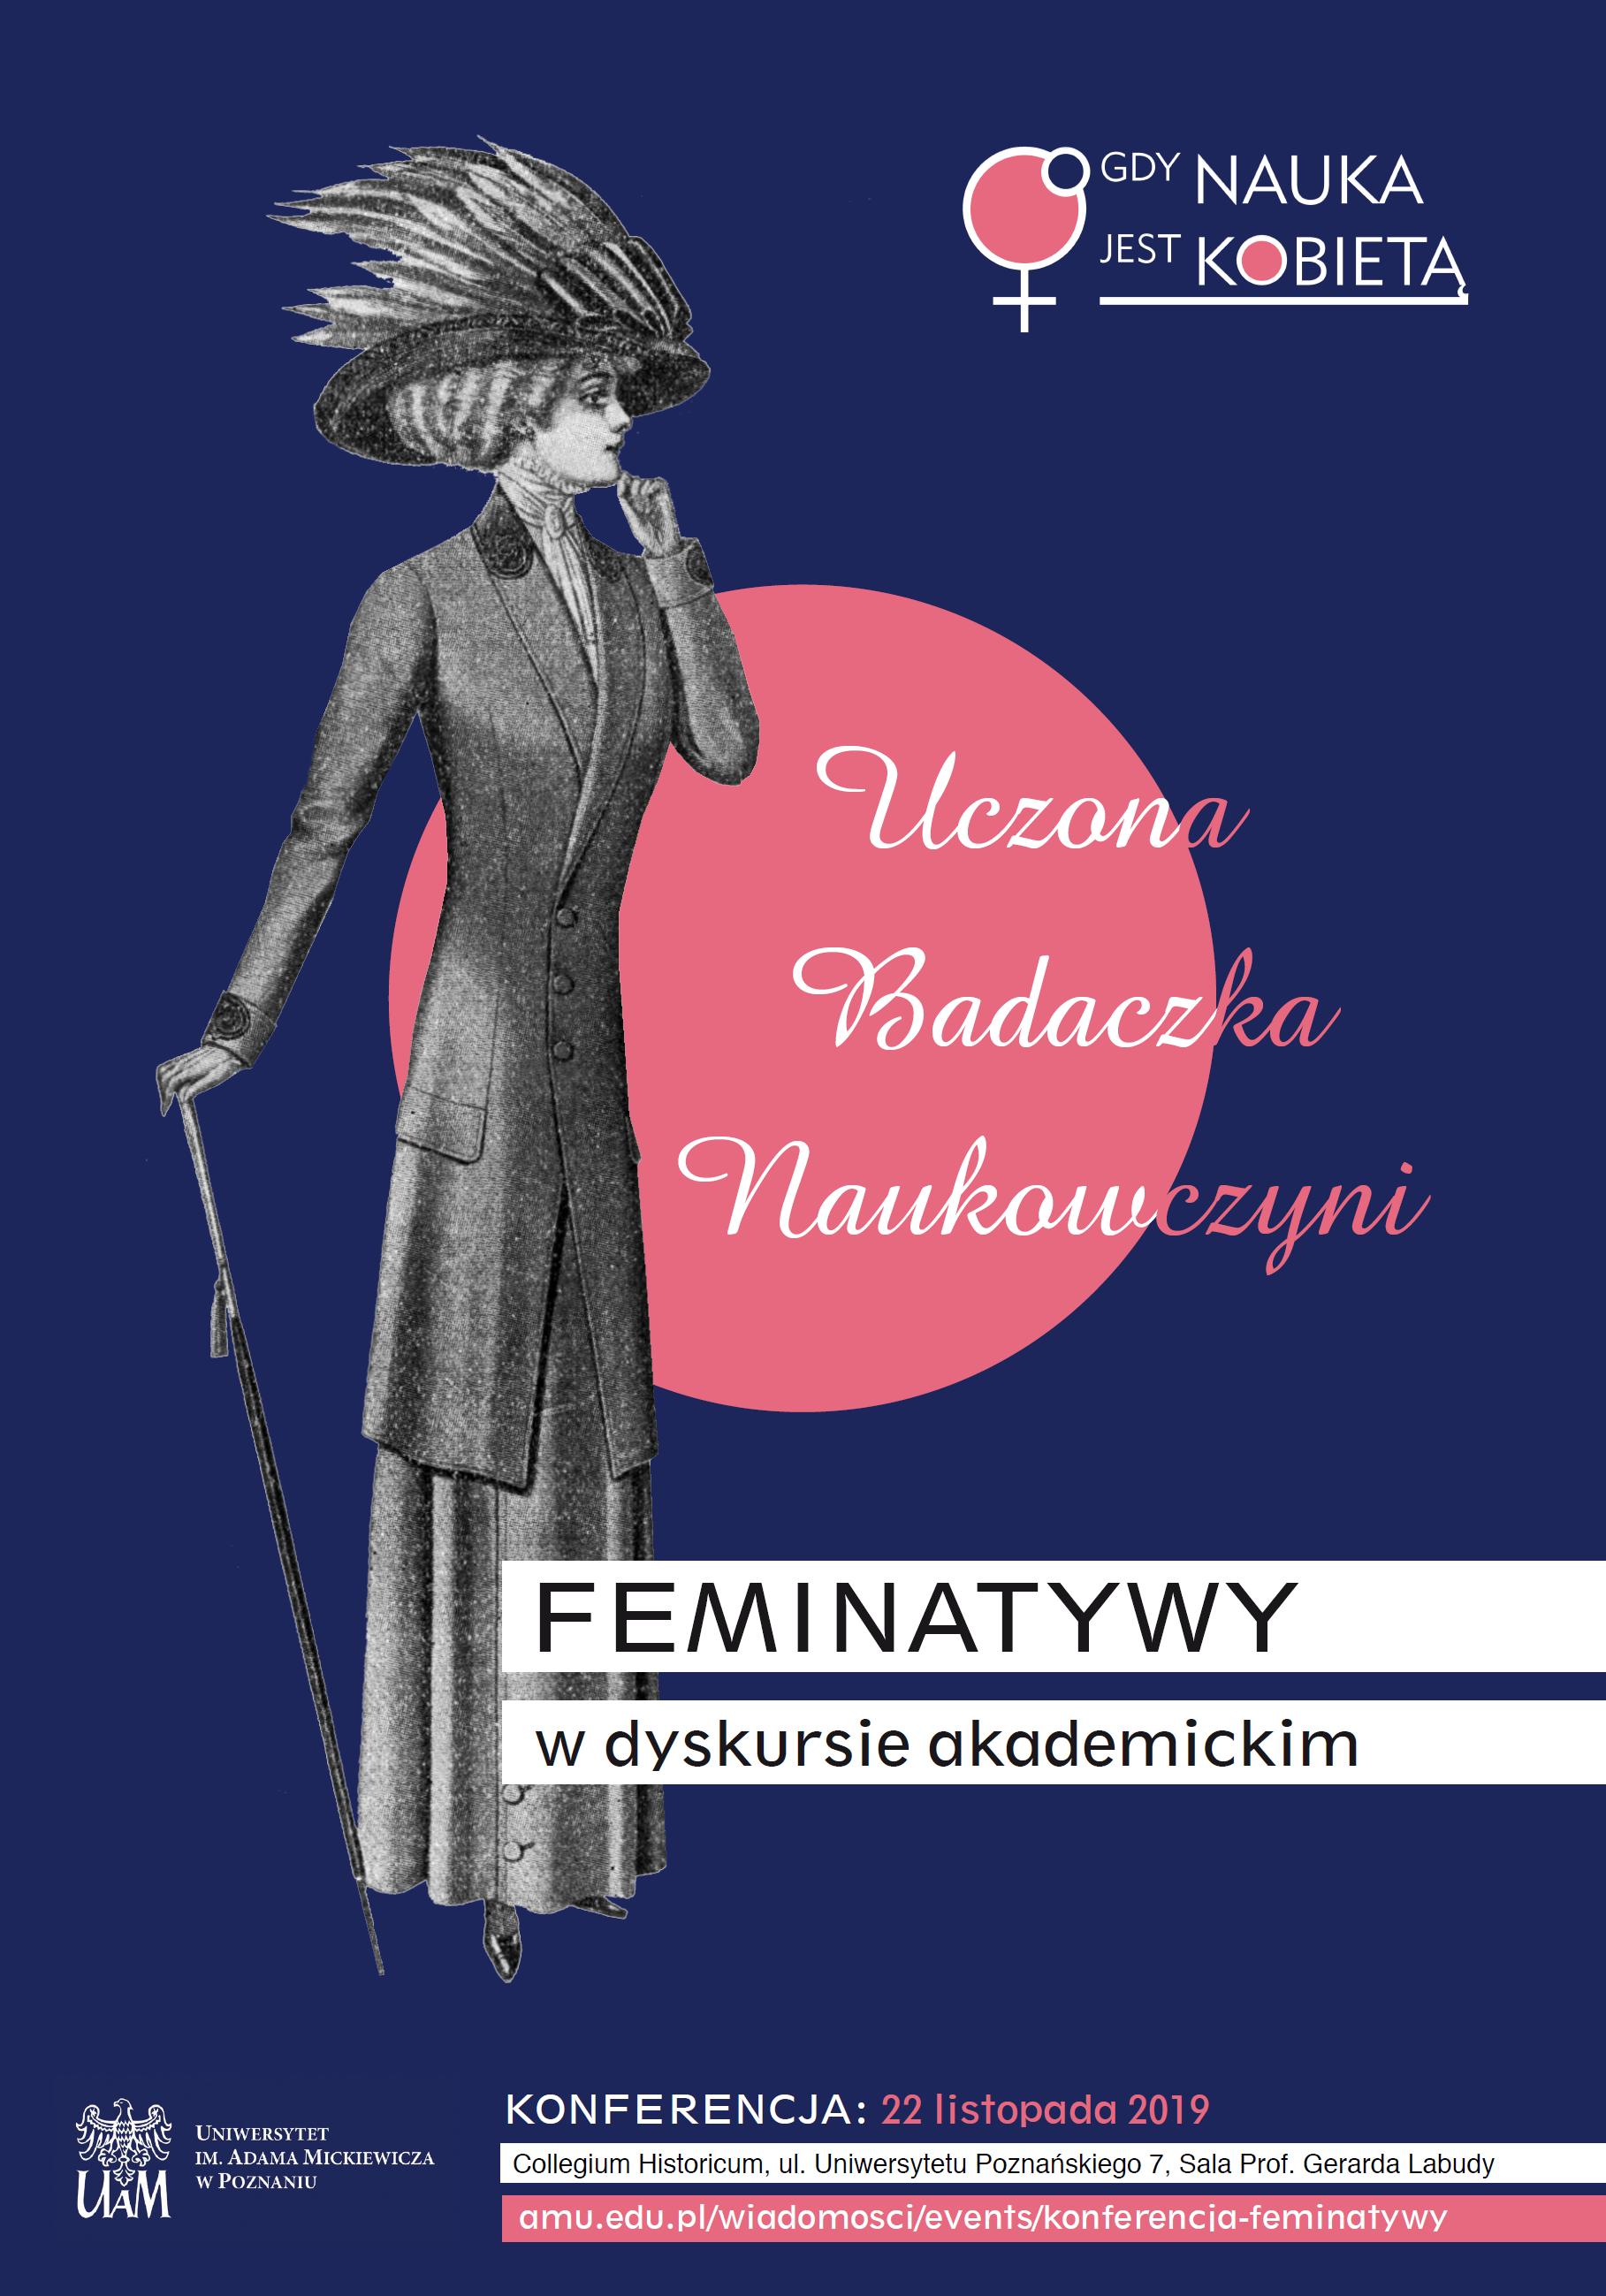 Plakat konferencji Feminatywy